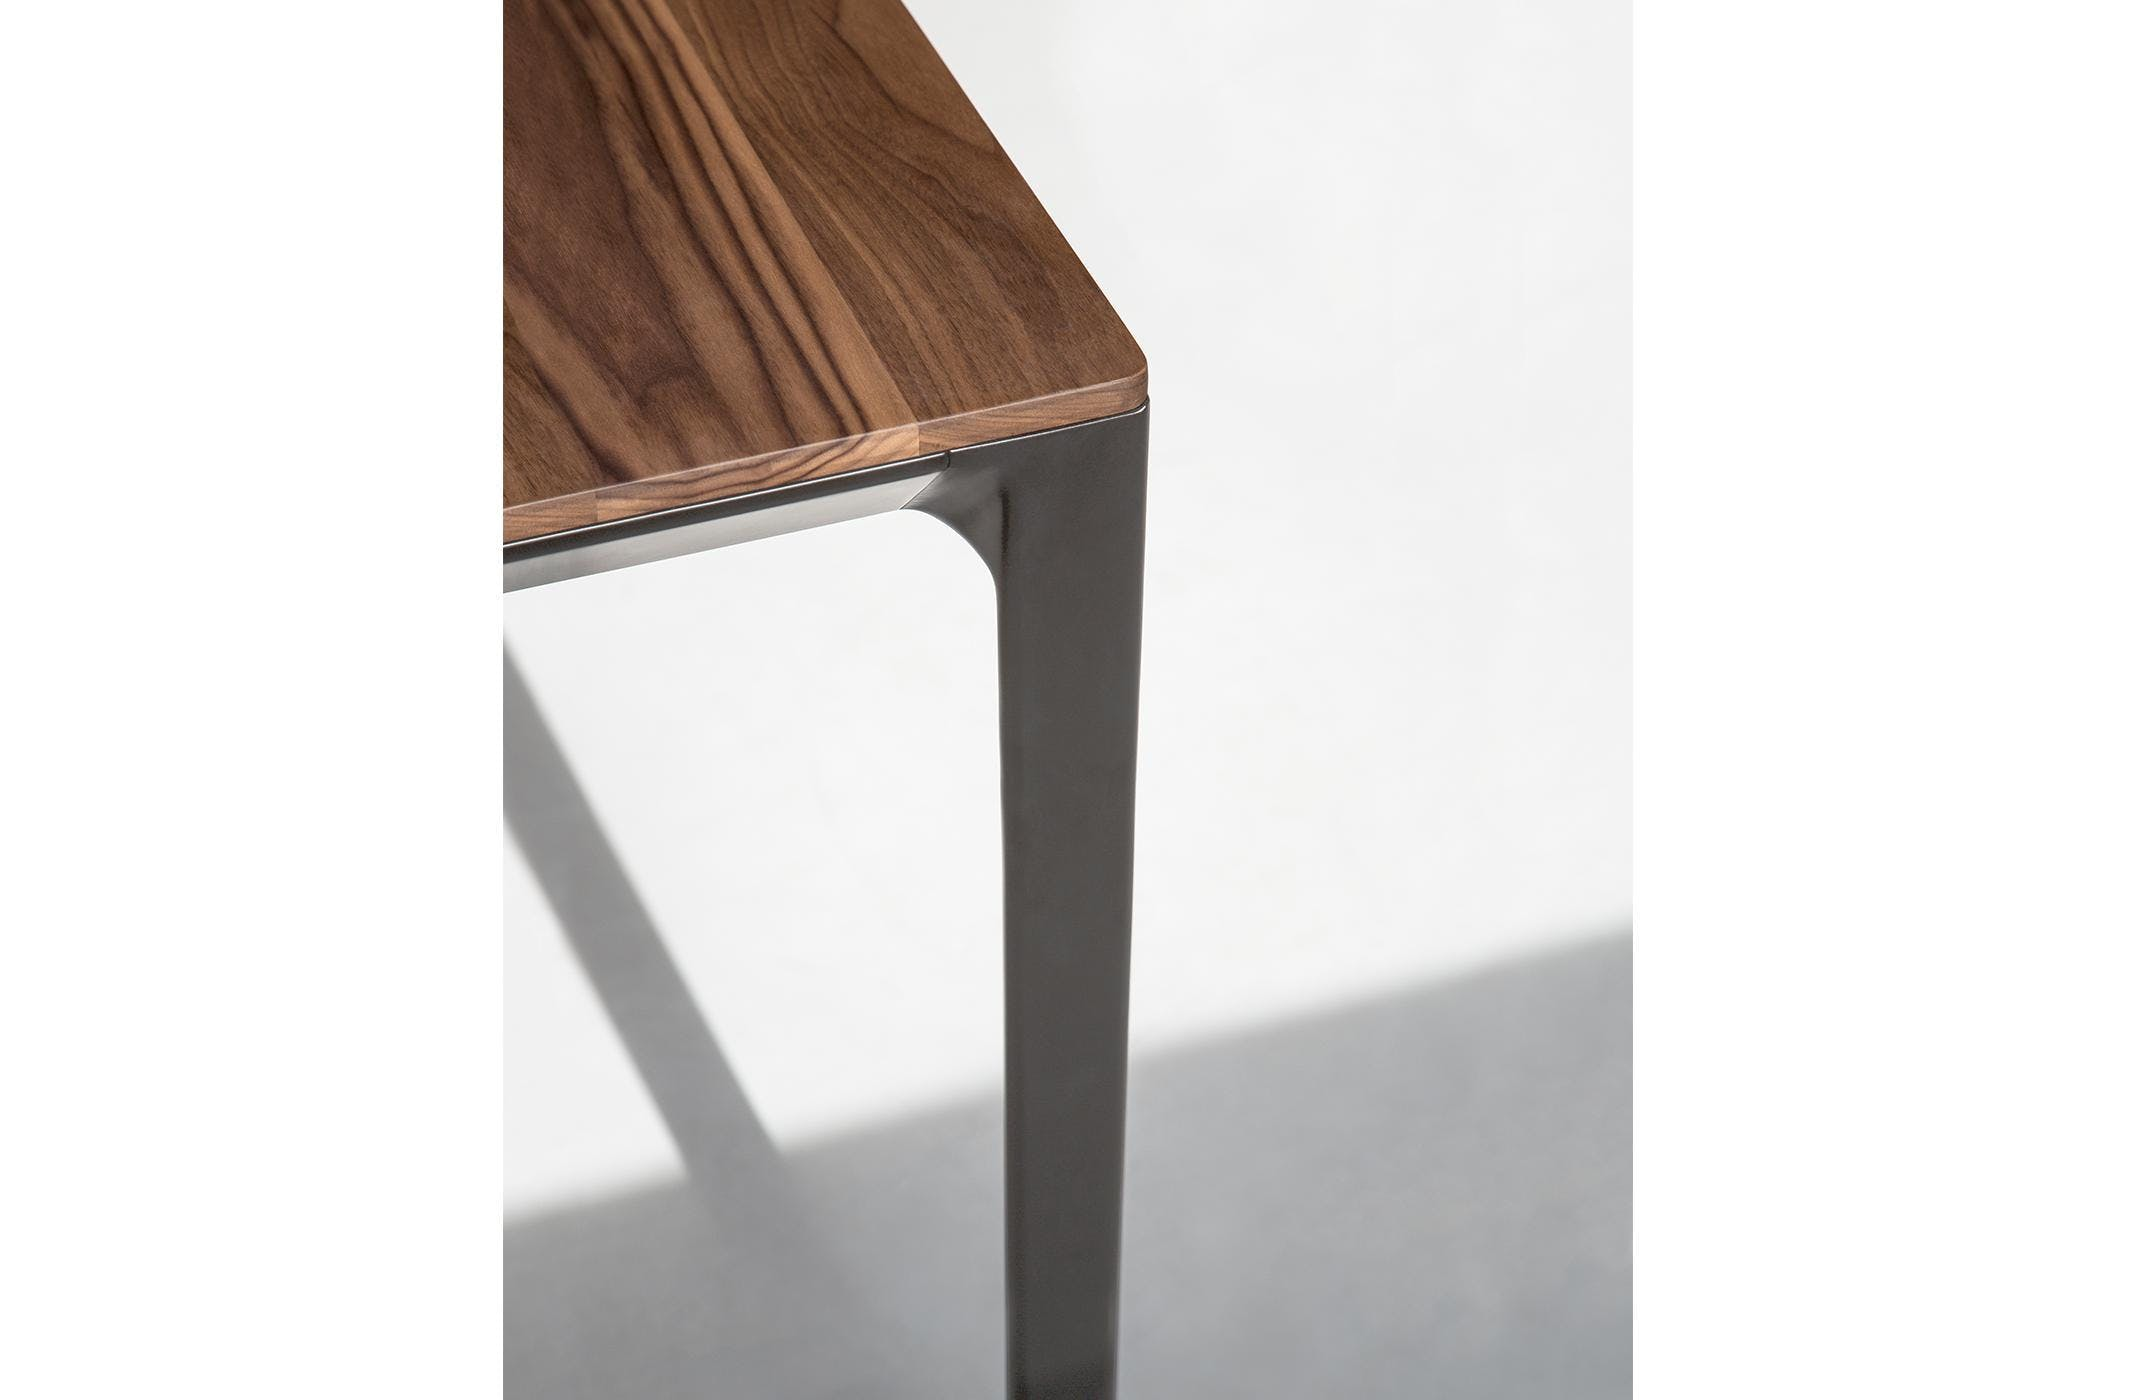 Bensen Able Table Detail